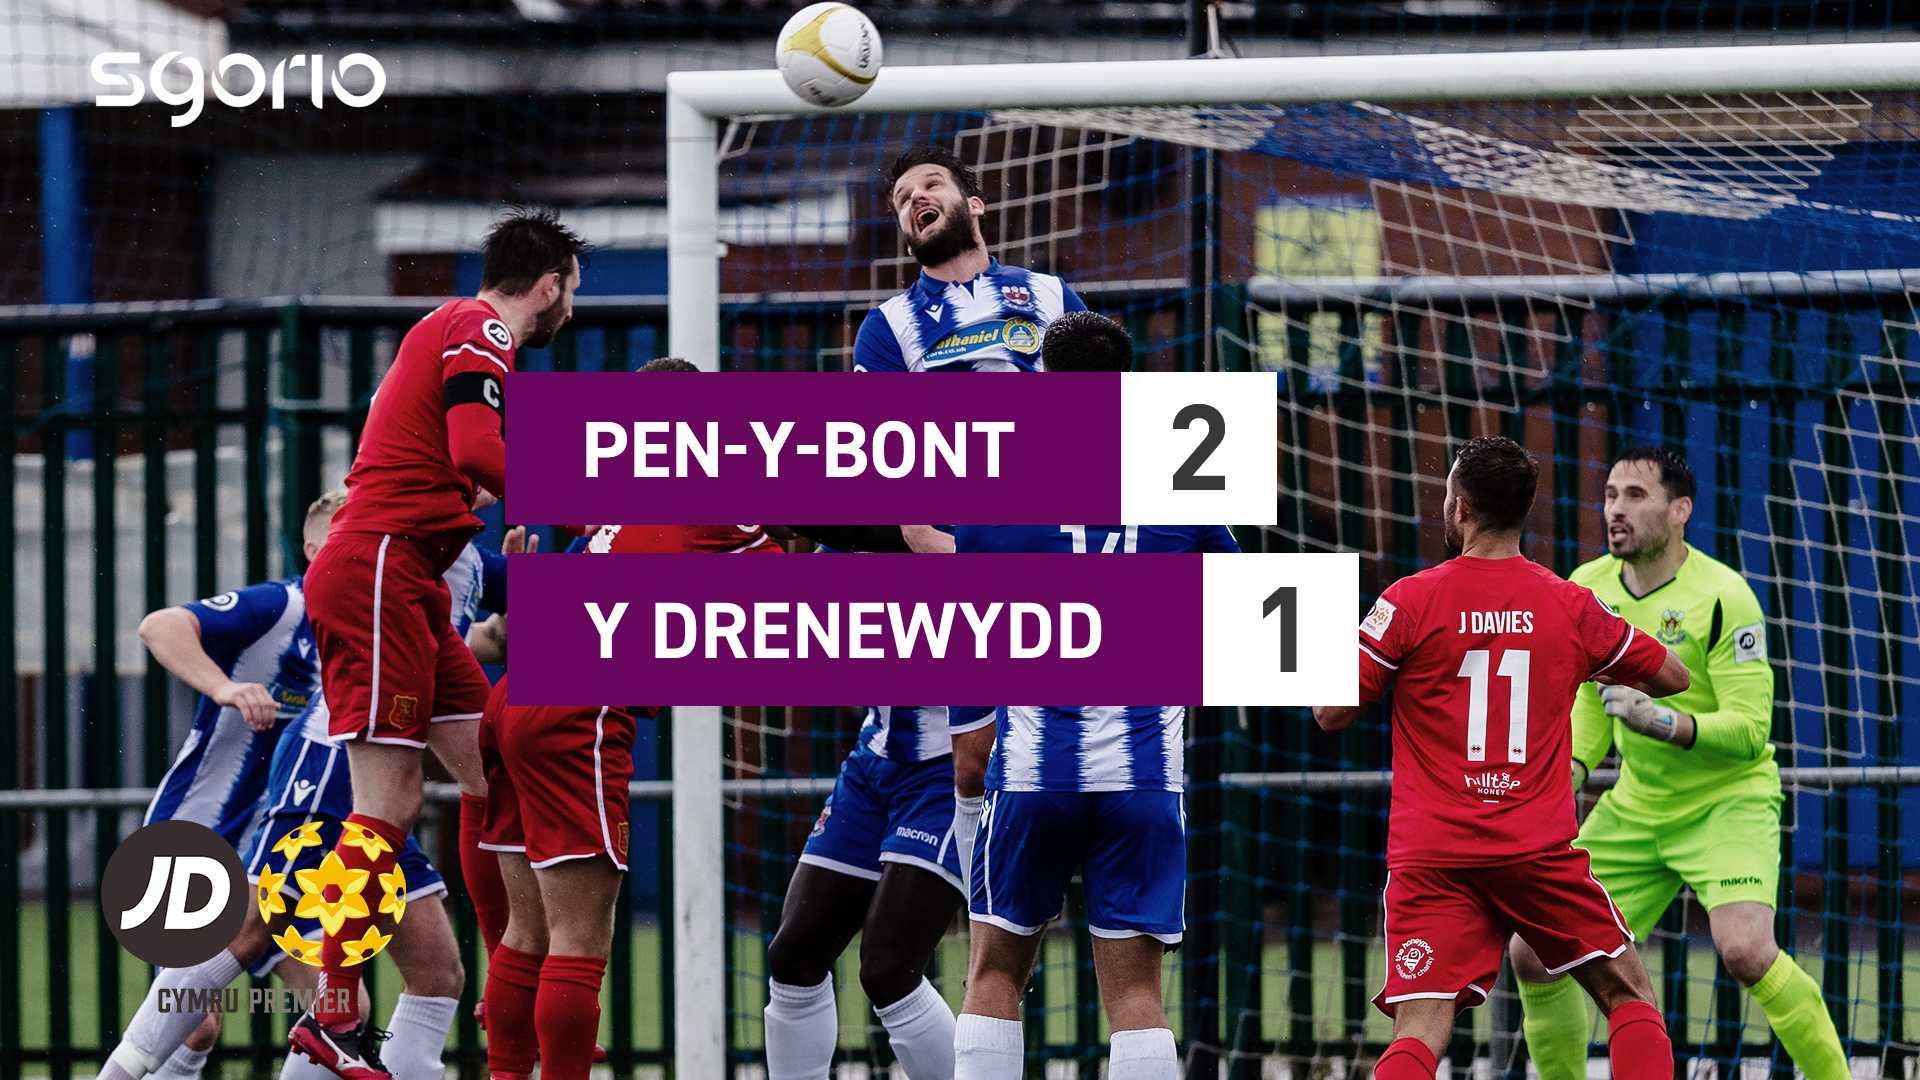 Pen-y-bont 2–1 Y Drenewydd